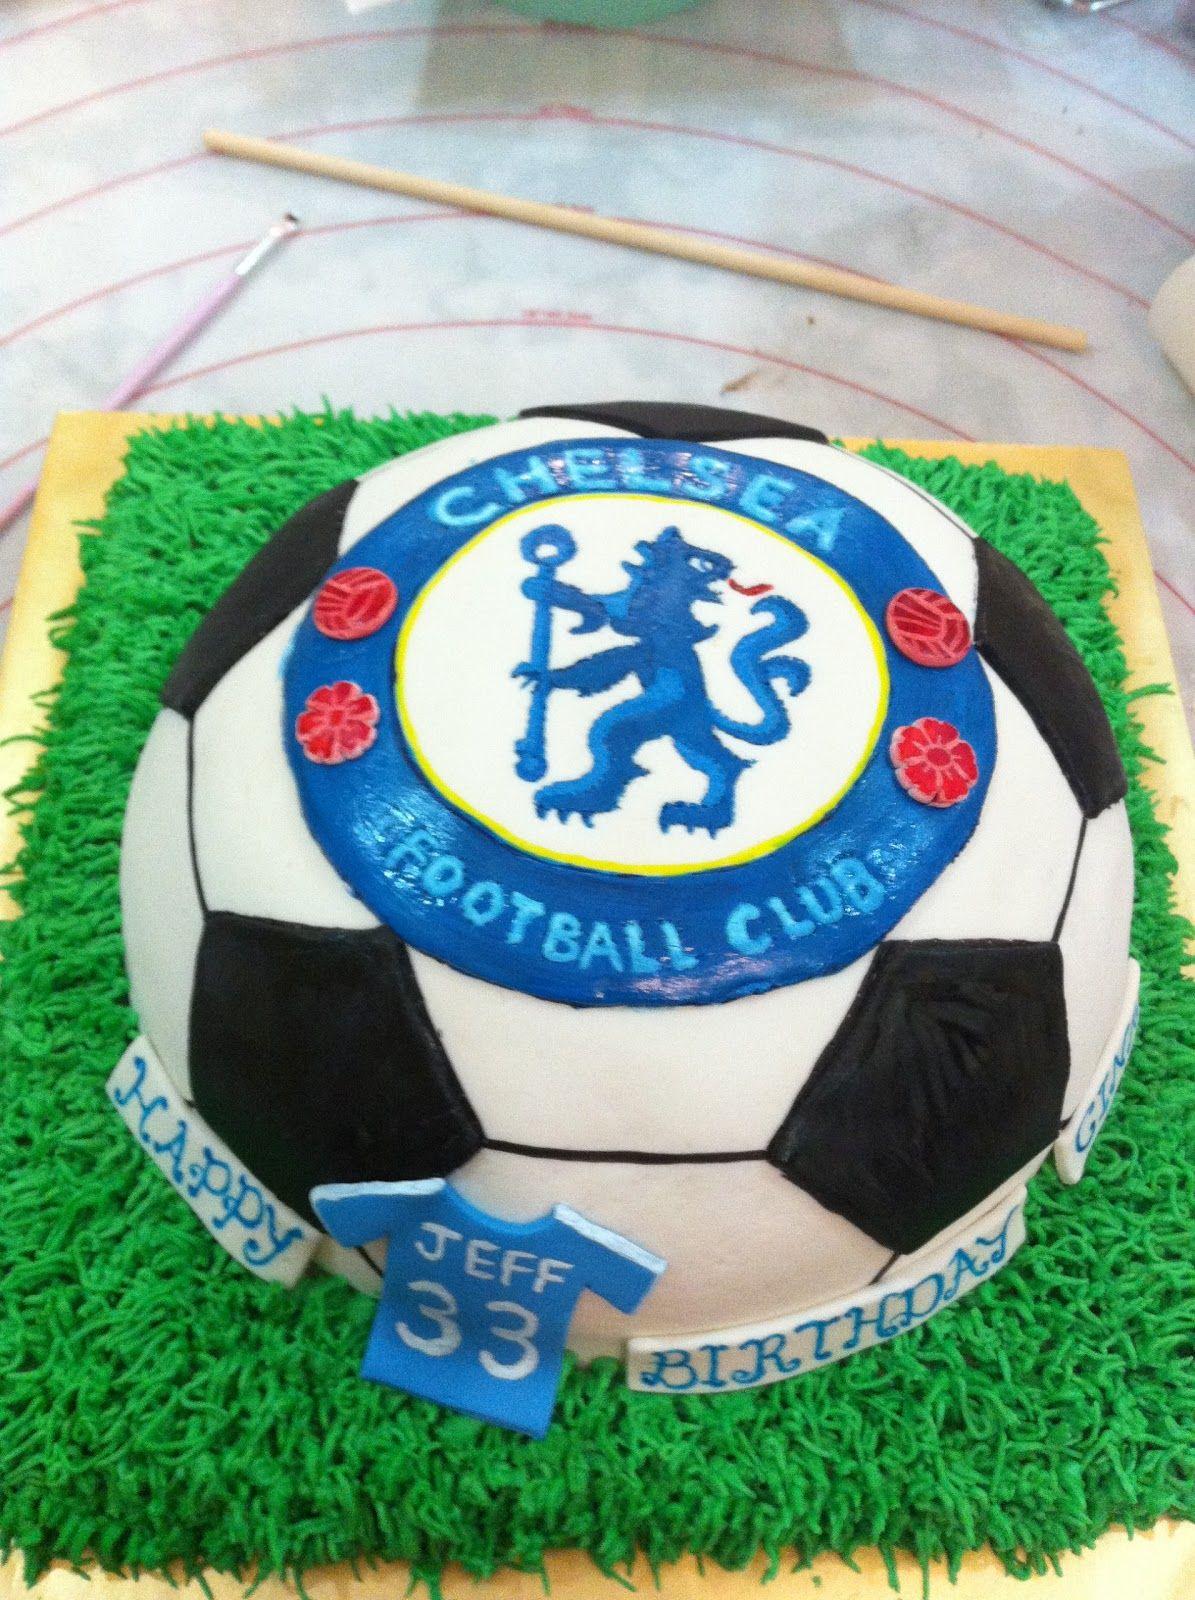 Pin by Susan Waijenberg on Nick 21 | Soccer cake, Soccer